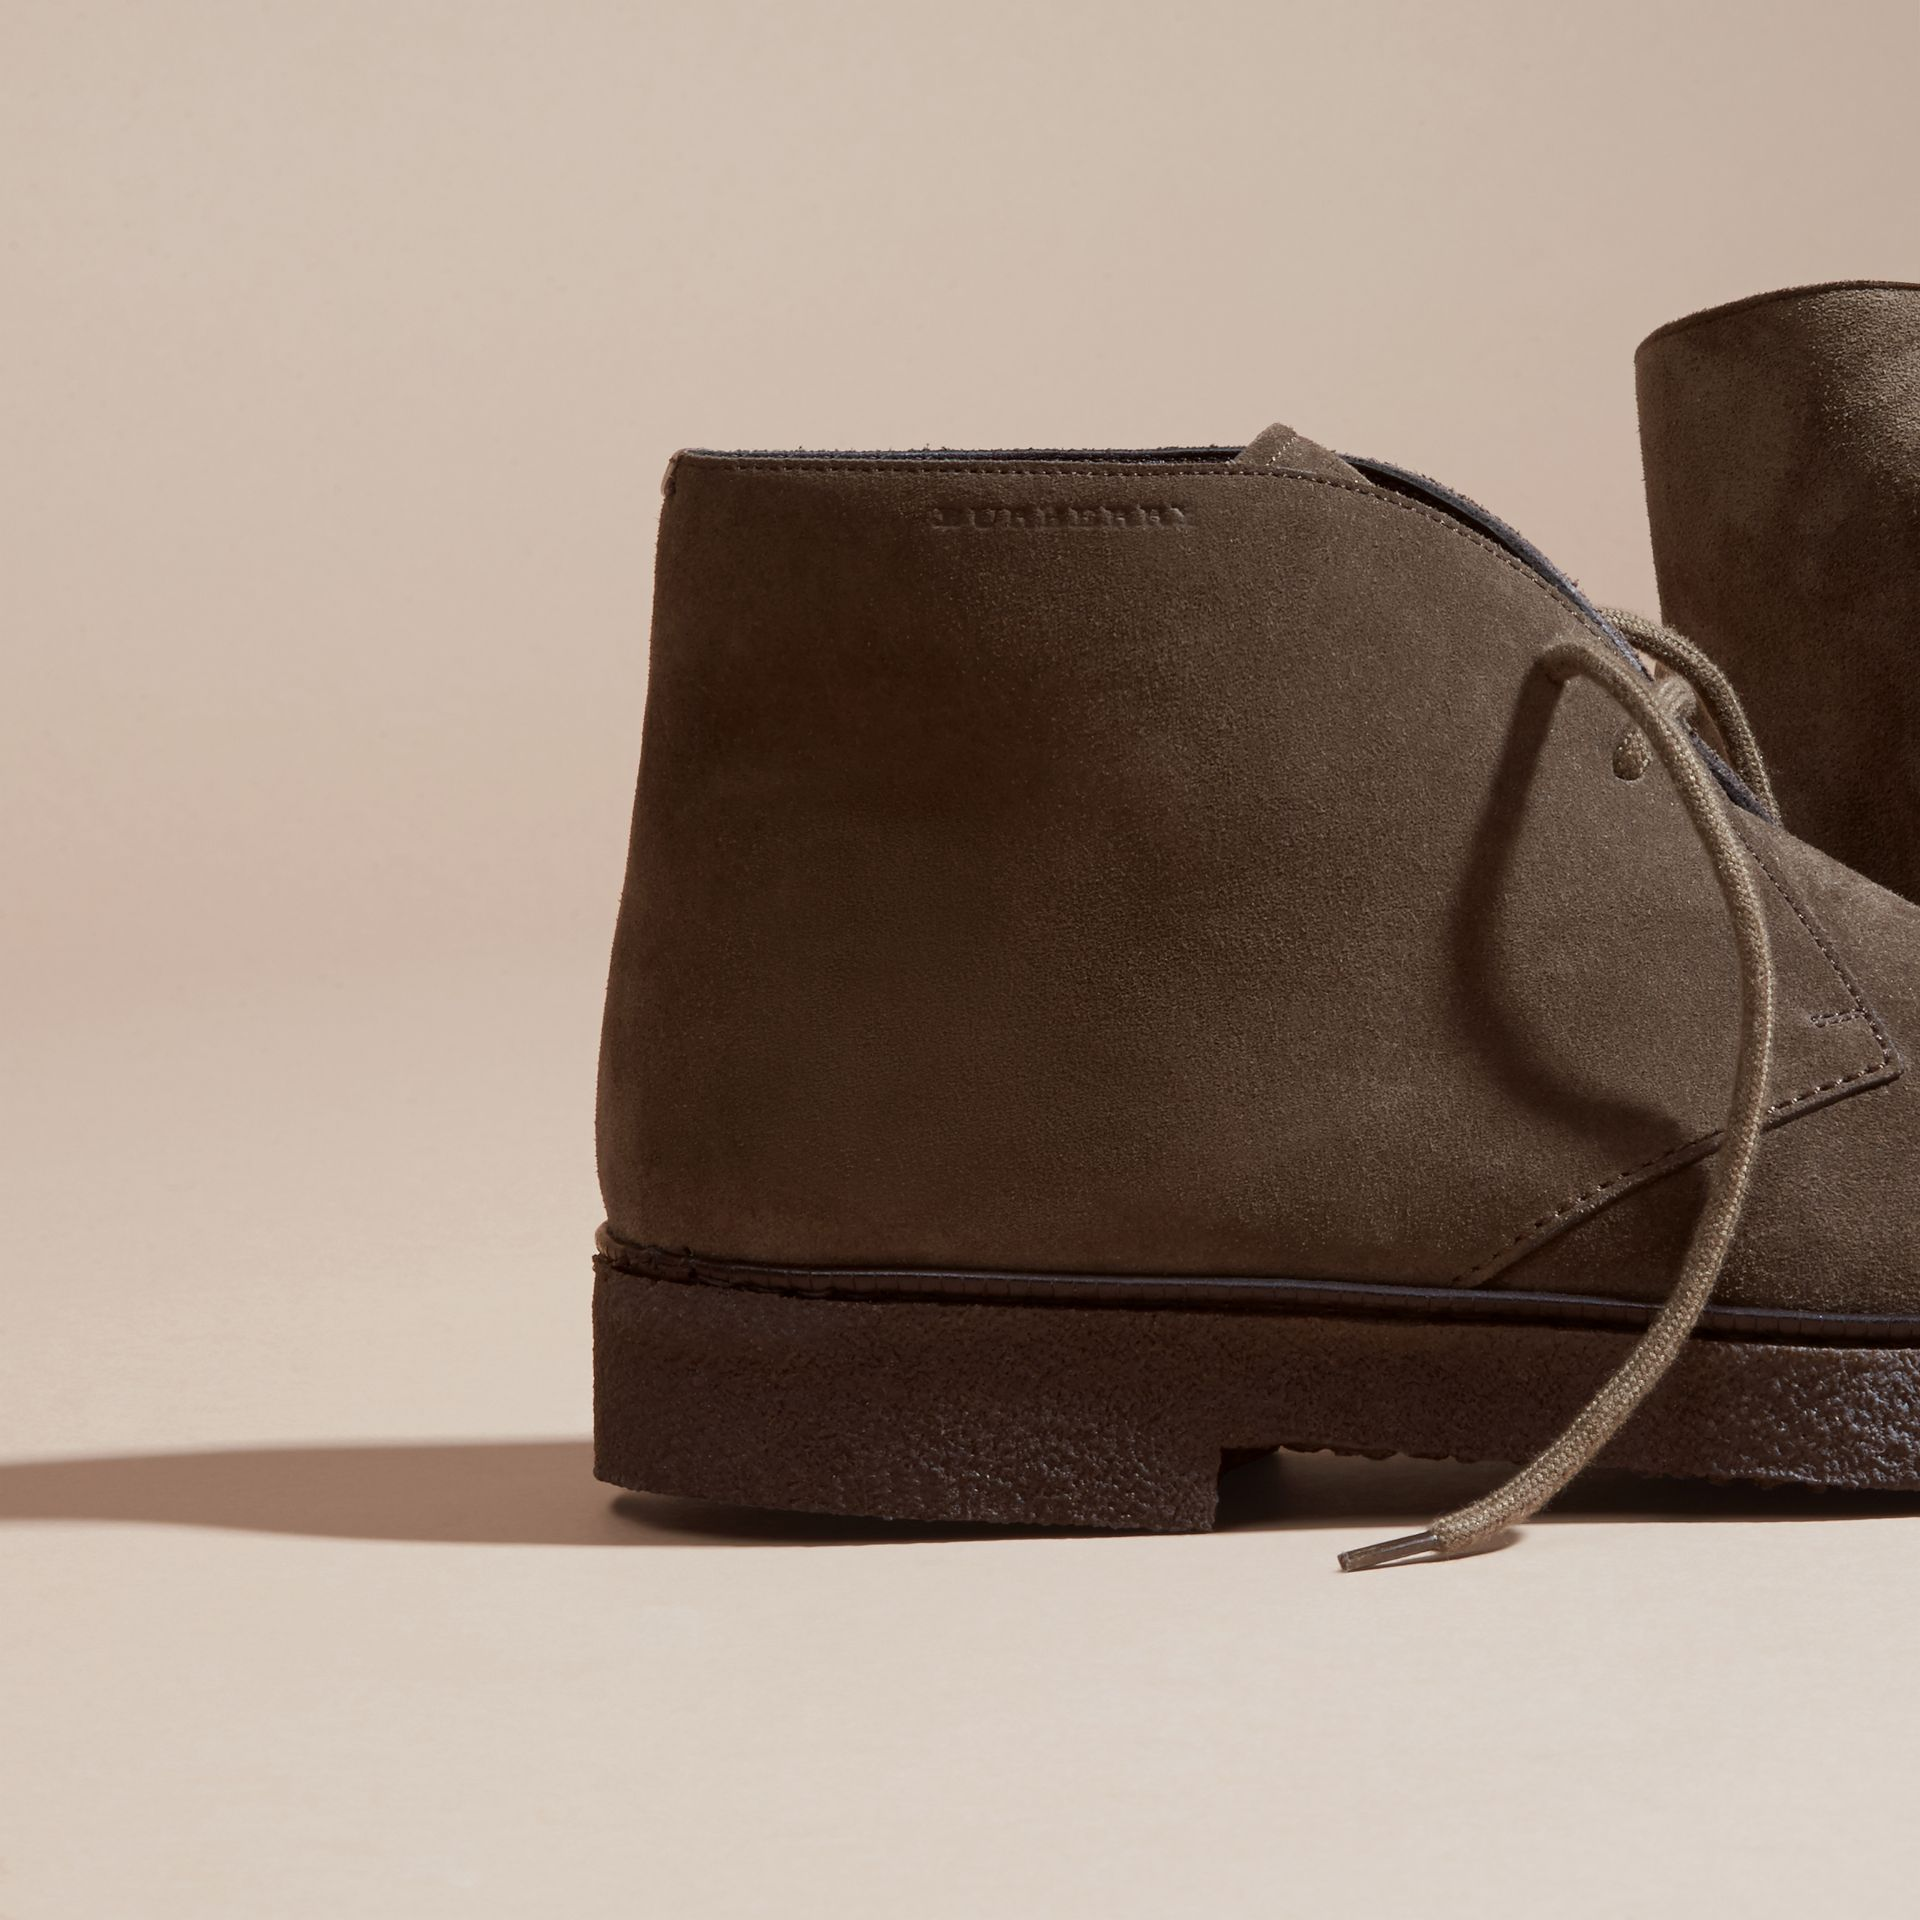 Kaki Bottines chukka en cuir velours avec semelles en crêpe Kaki - photo de la galerie 2